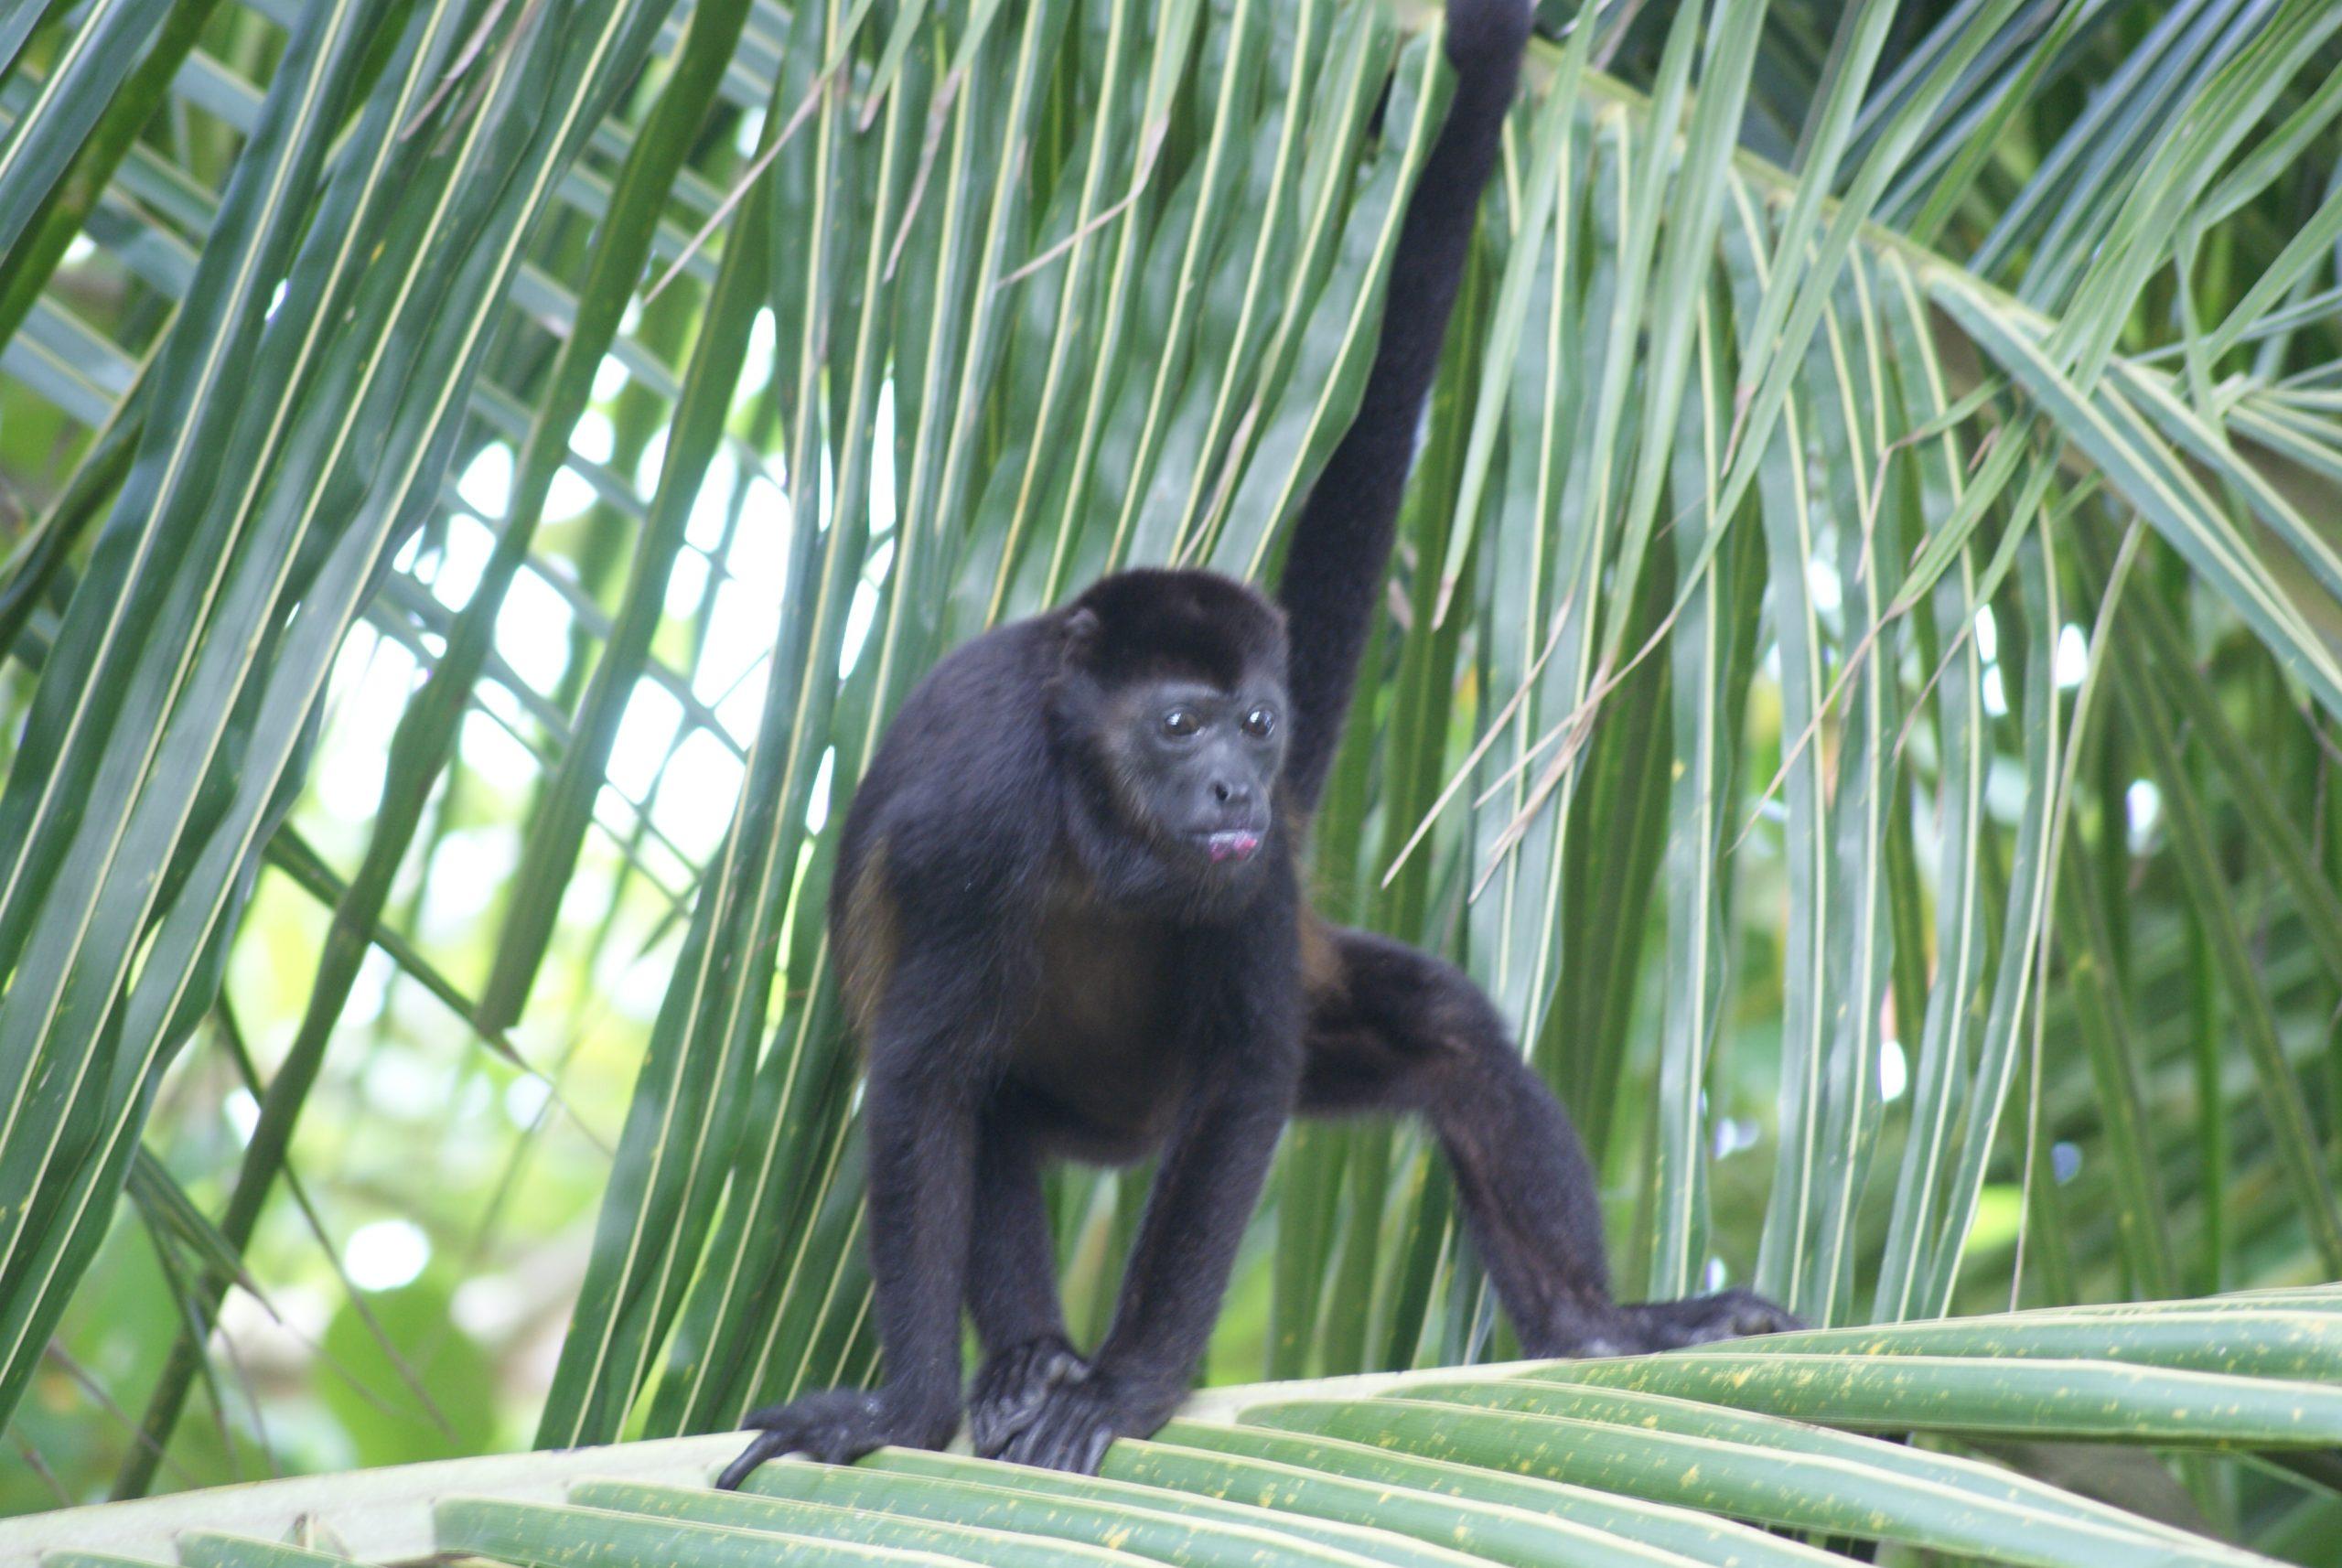 monkey hanging in palm tree near Tamarindo, Costa Rica